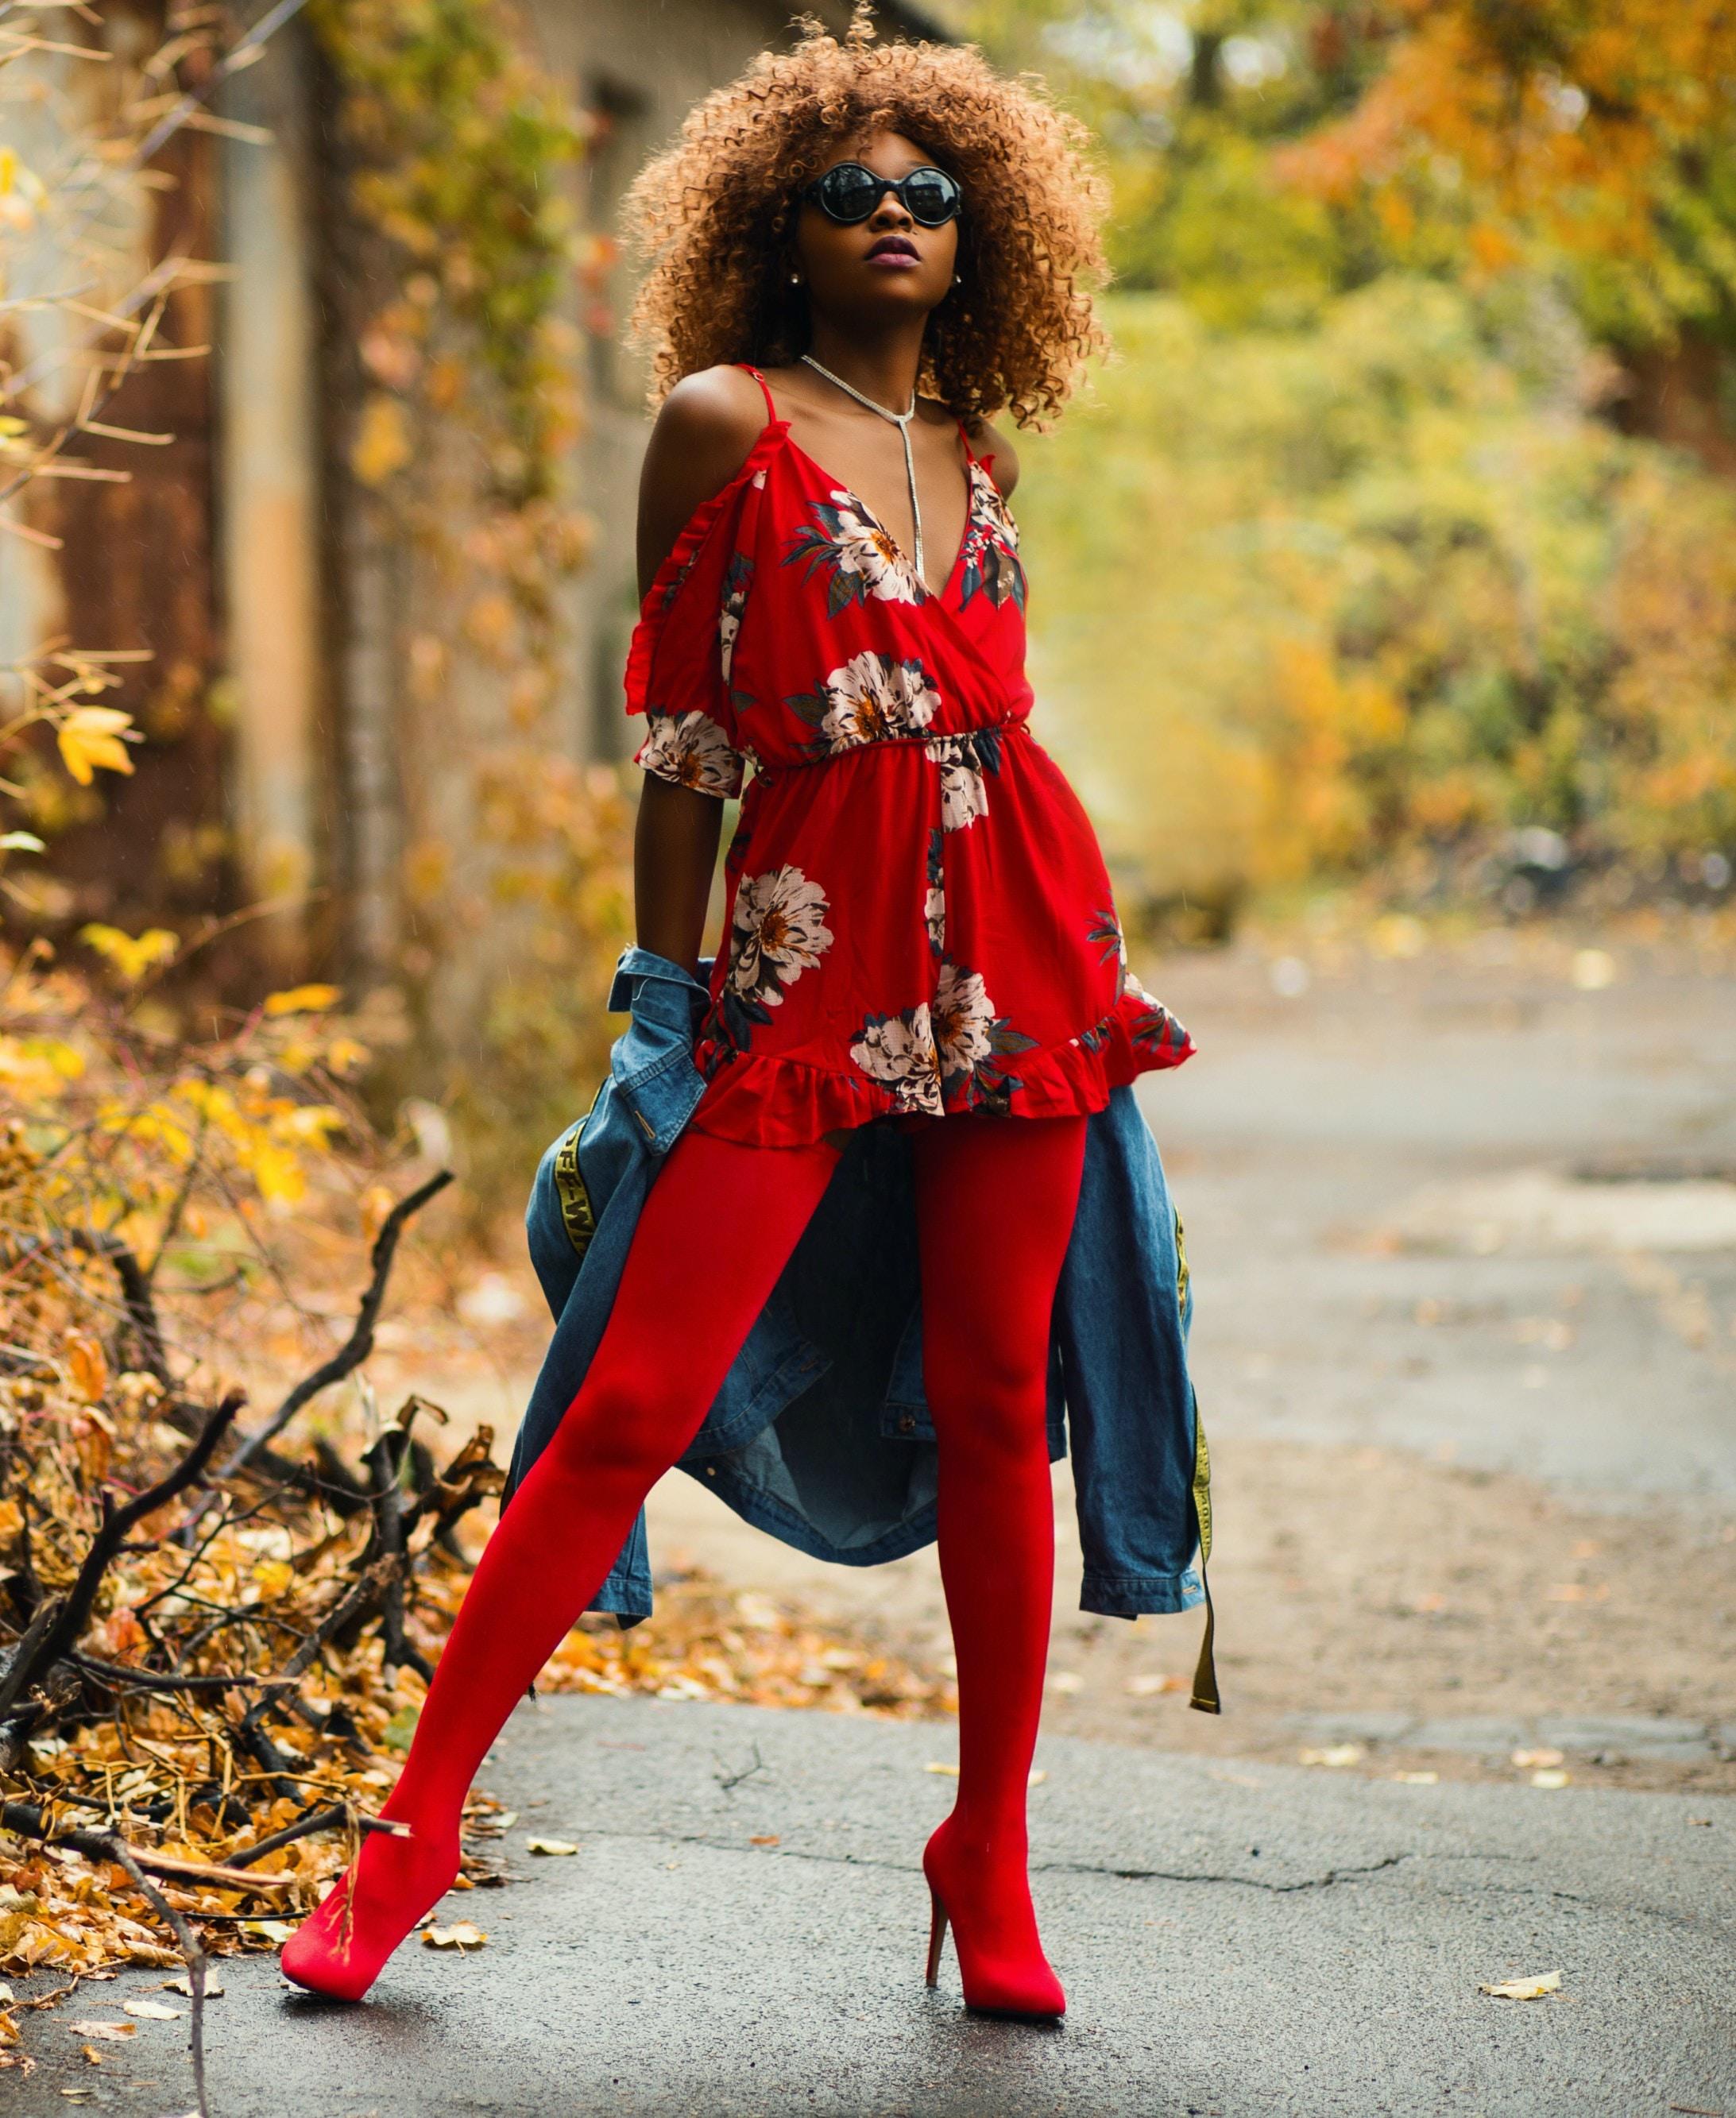 Six Very Tall Women Explain Why They Love High Heels